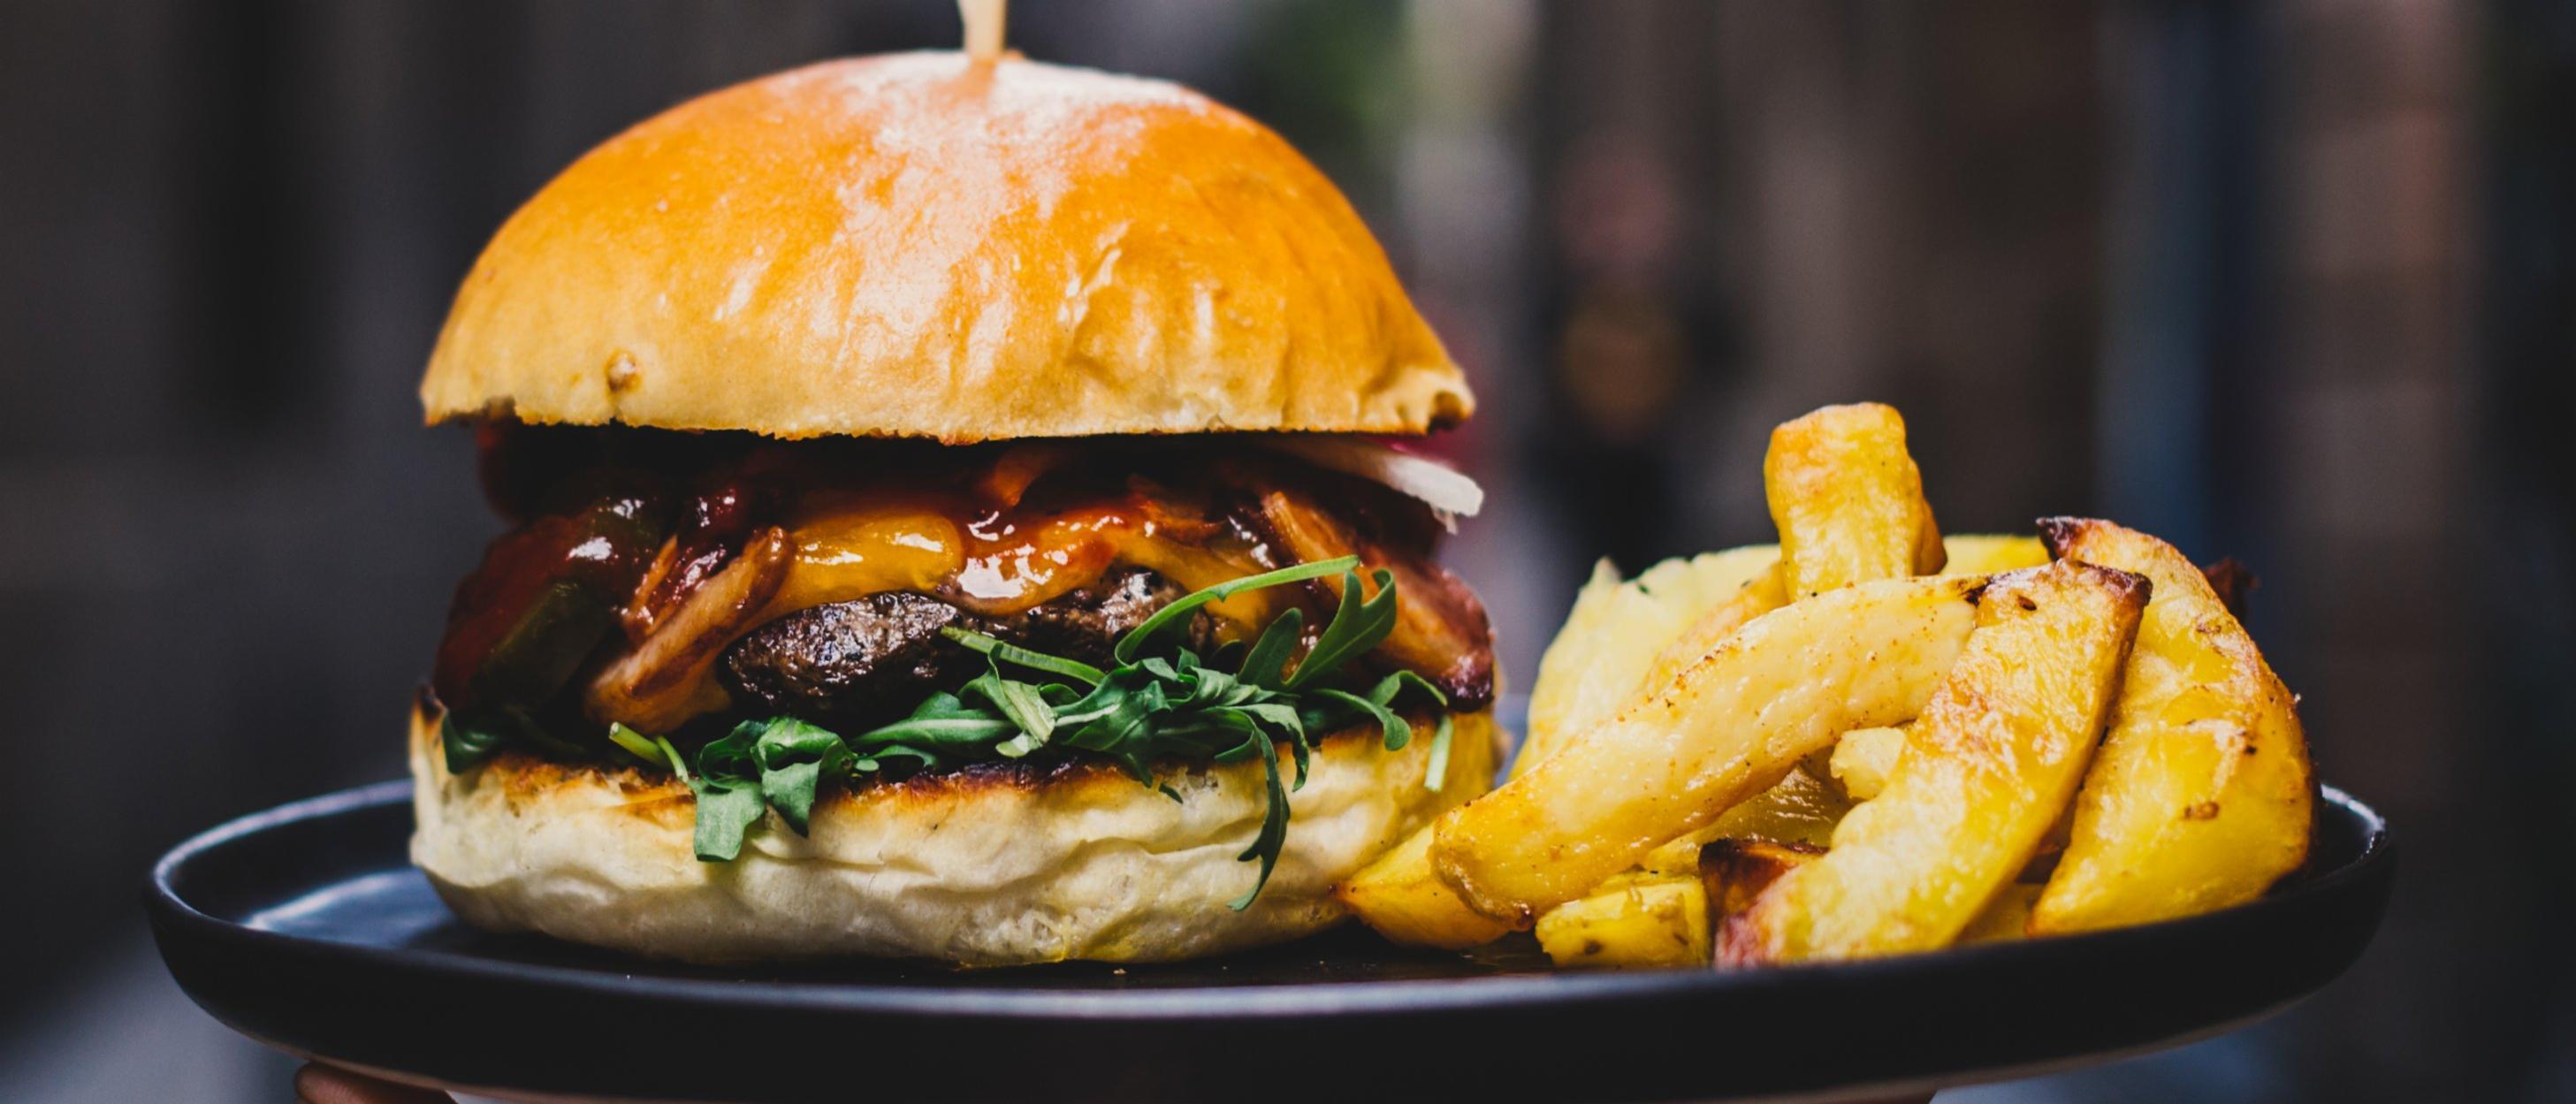 custom-Custom_Size___hamburger-and-fries_4460x4460